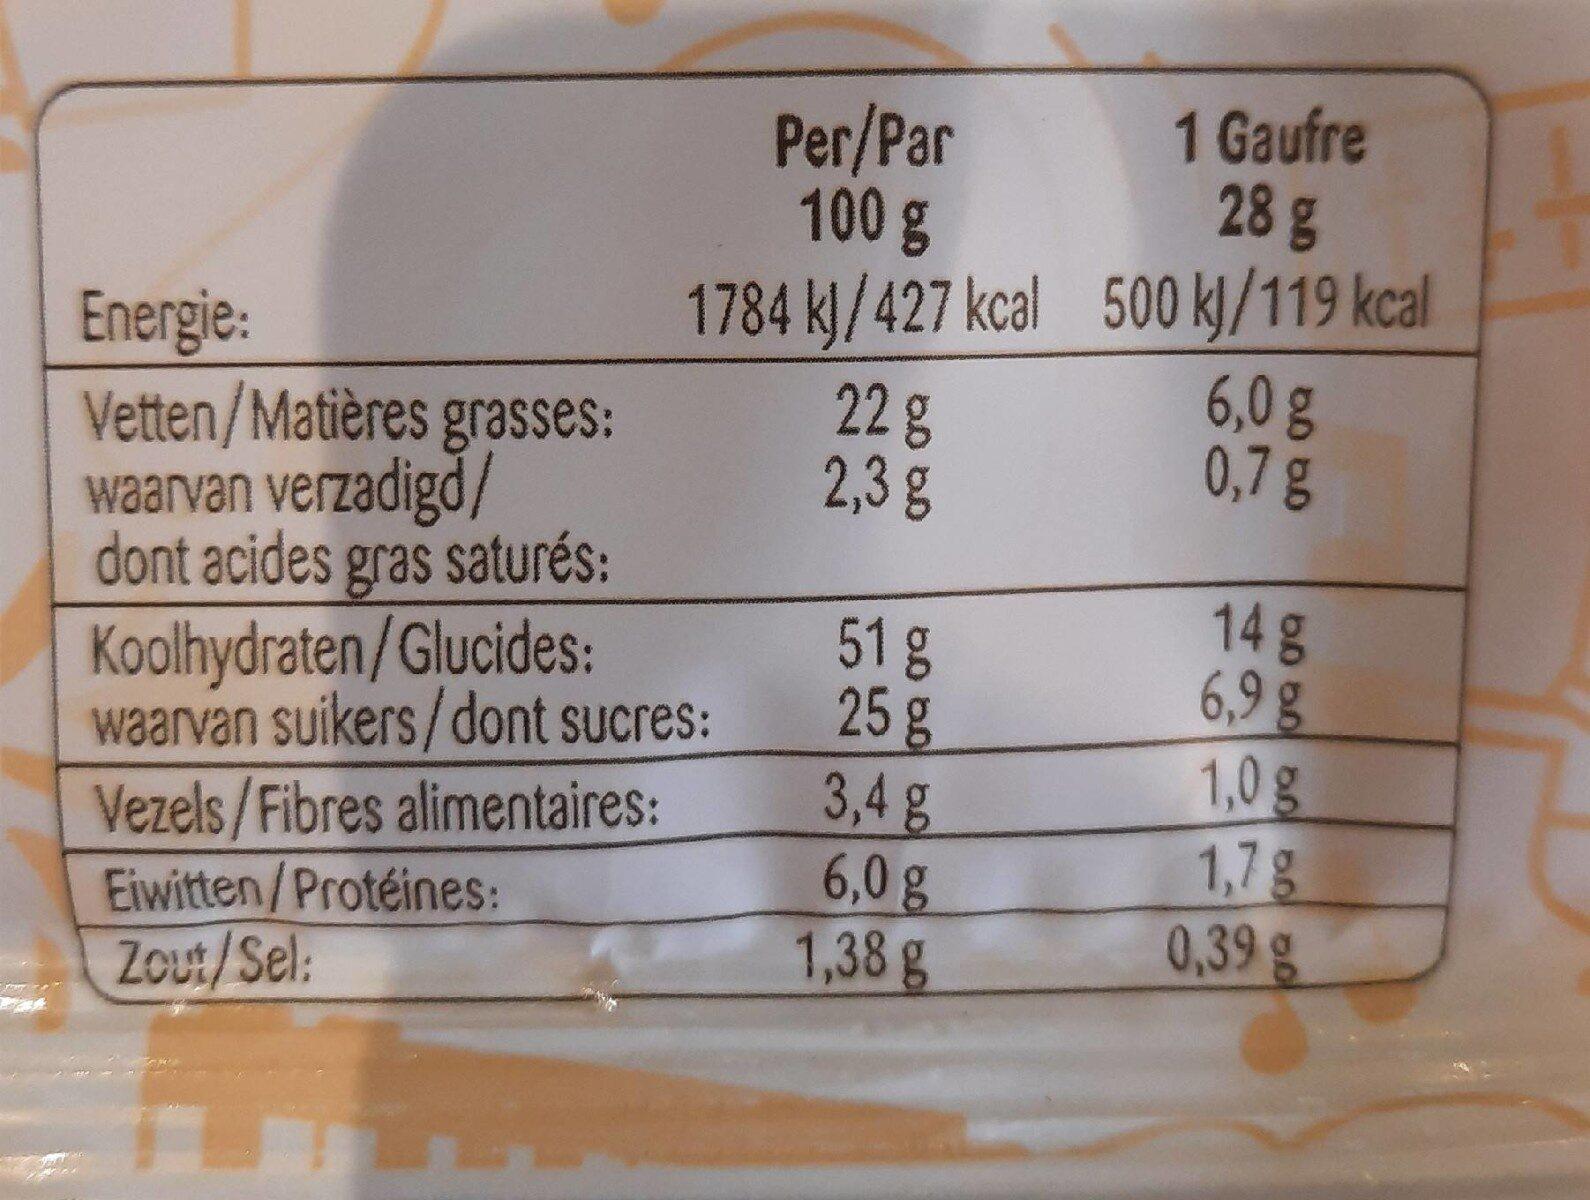 Gaufre vanille - Informations nutritionnelles - fr